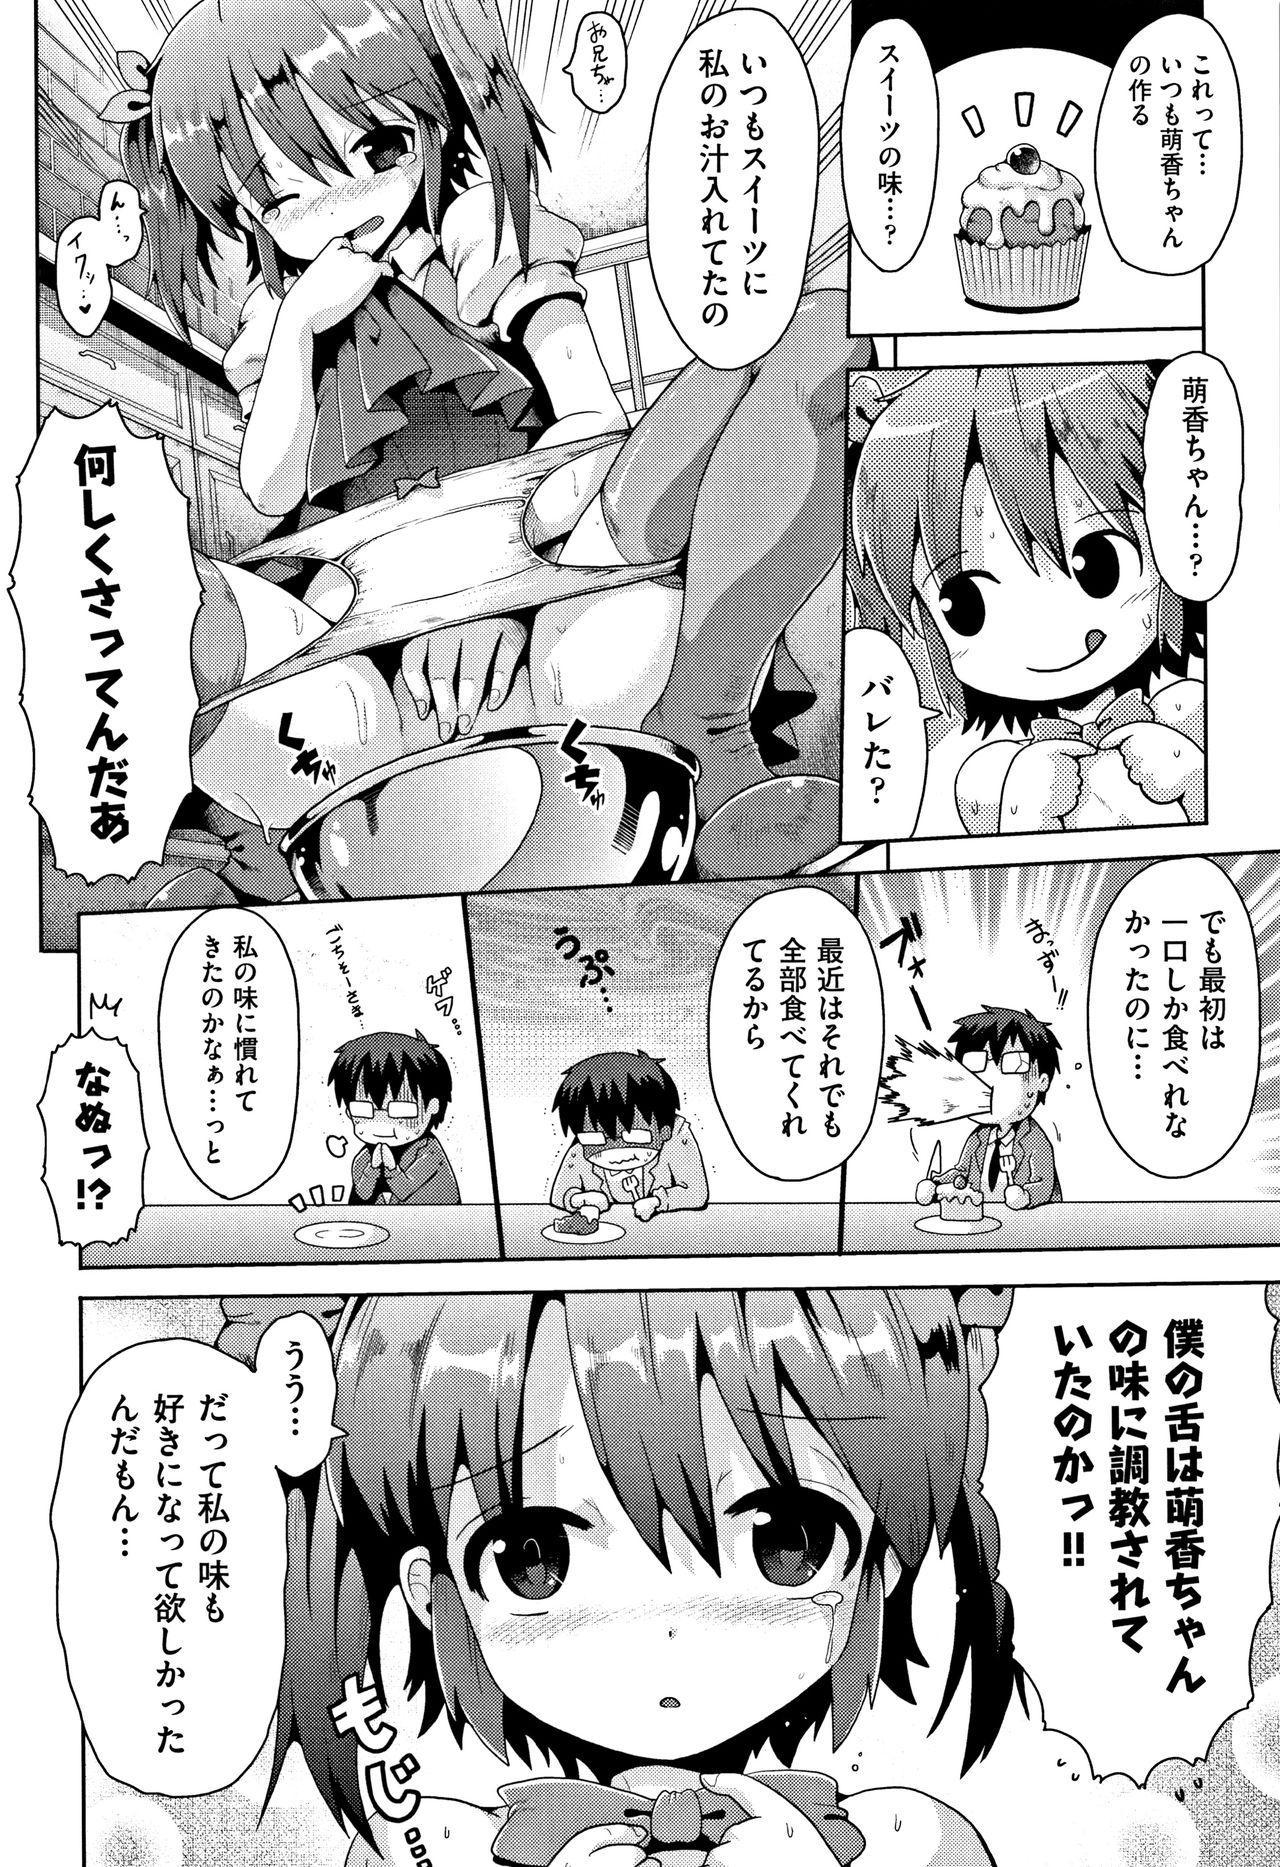 Kokugo Sansuu Rika Sex 182